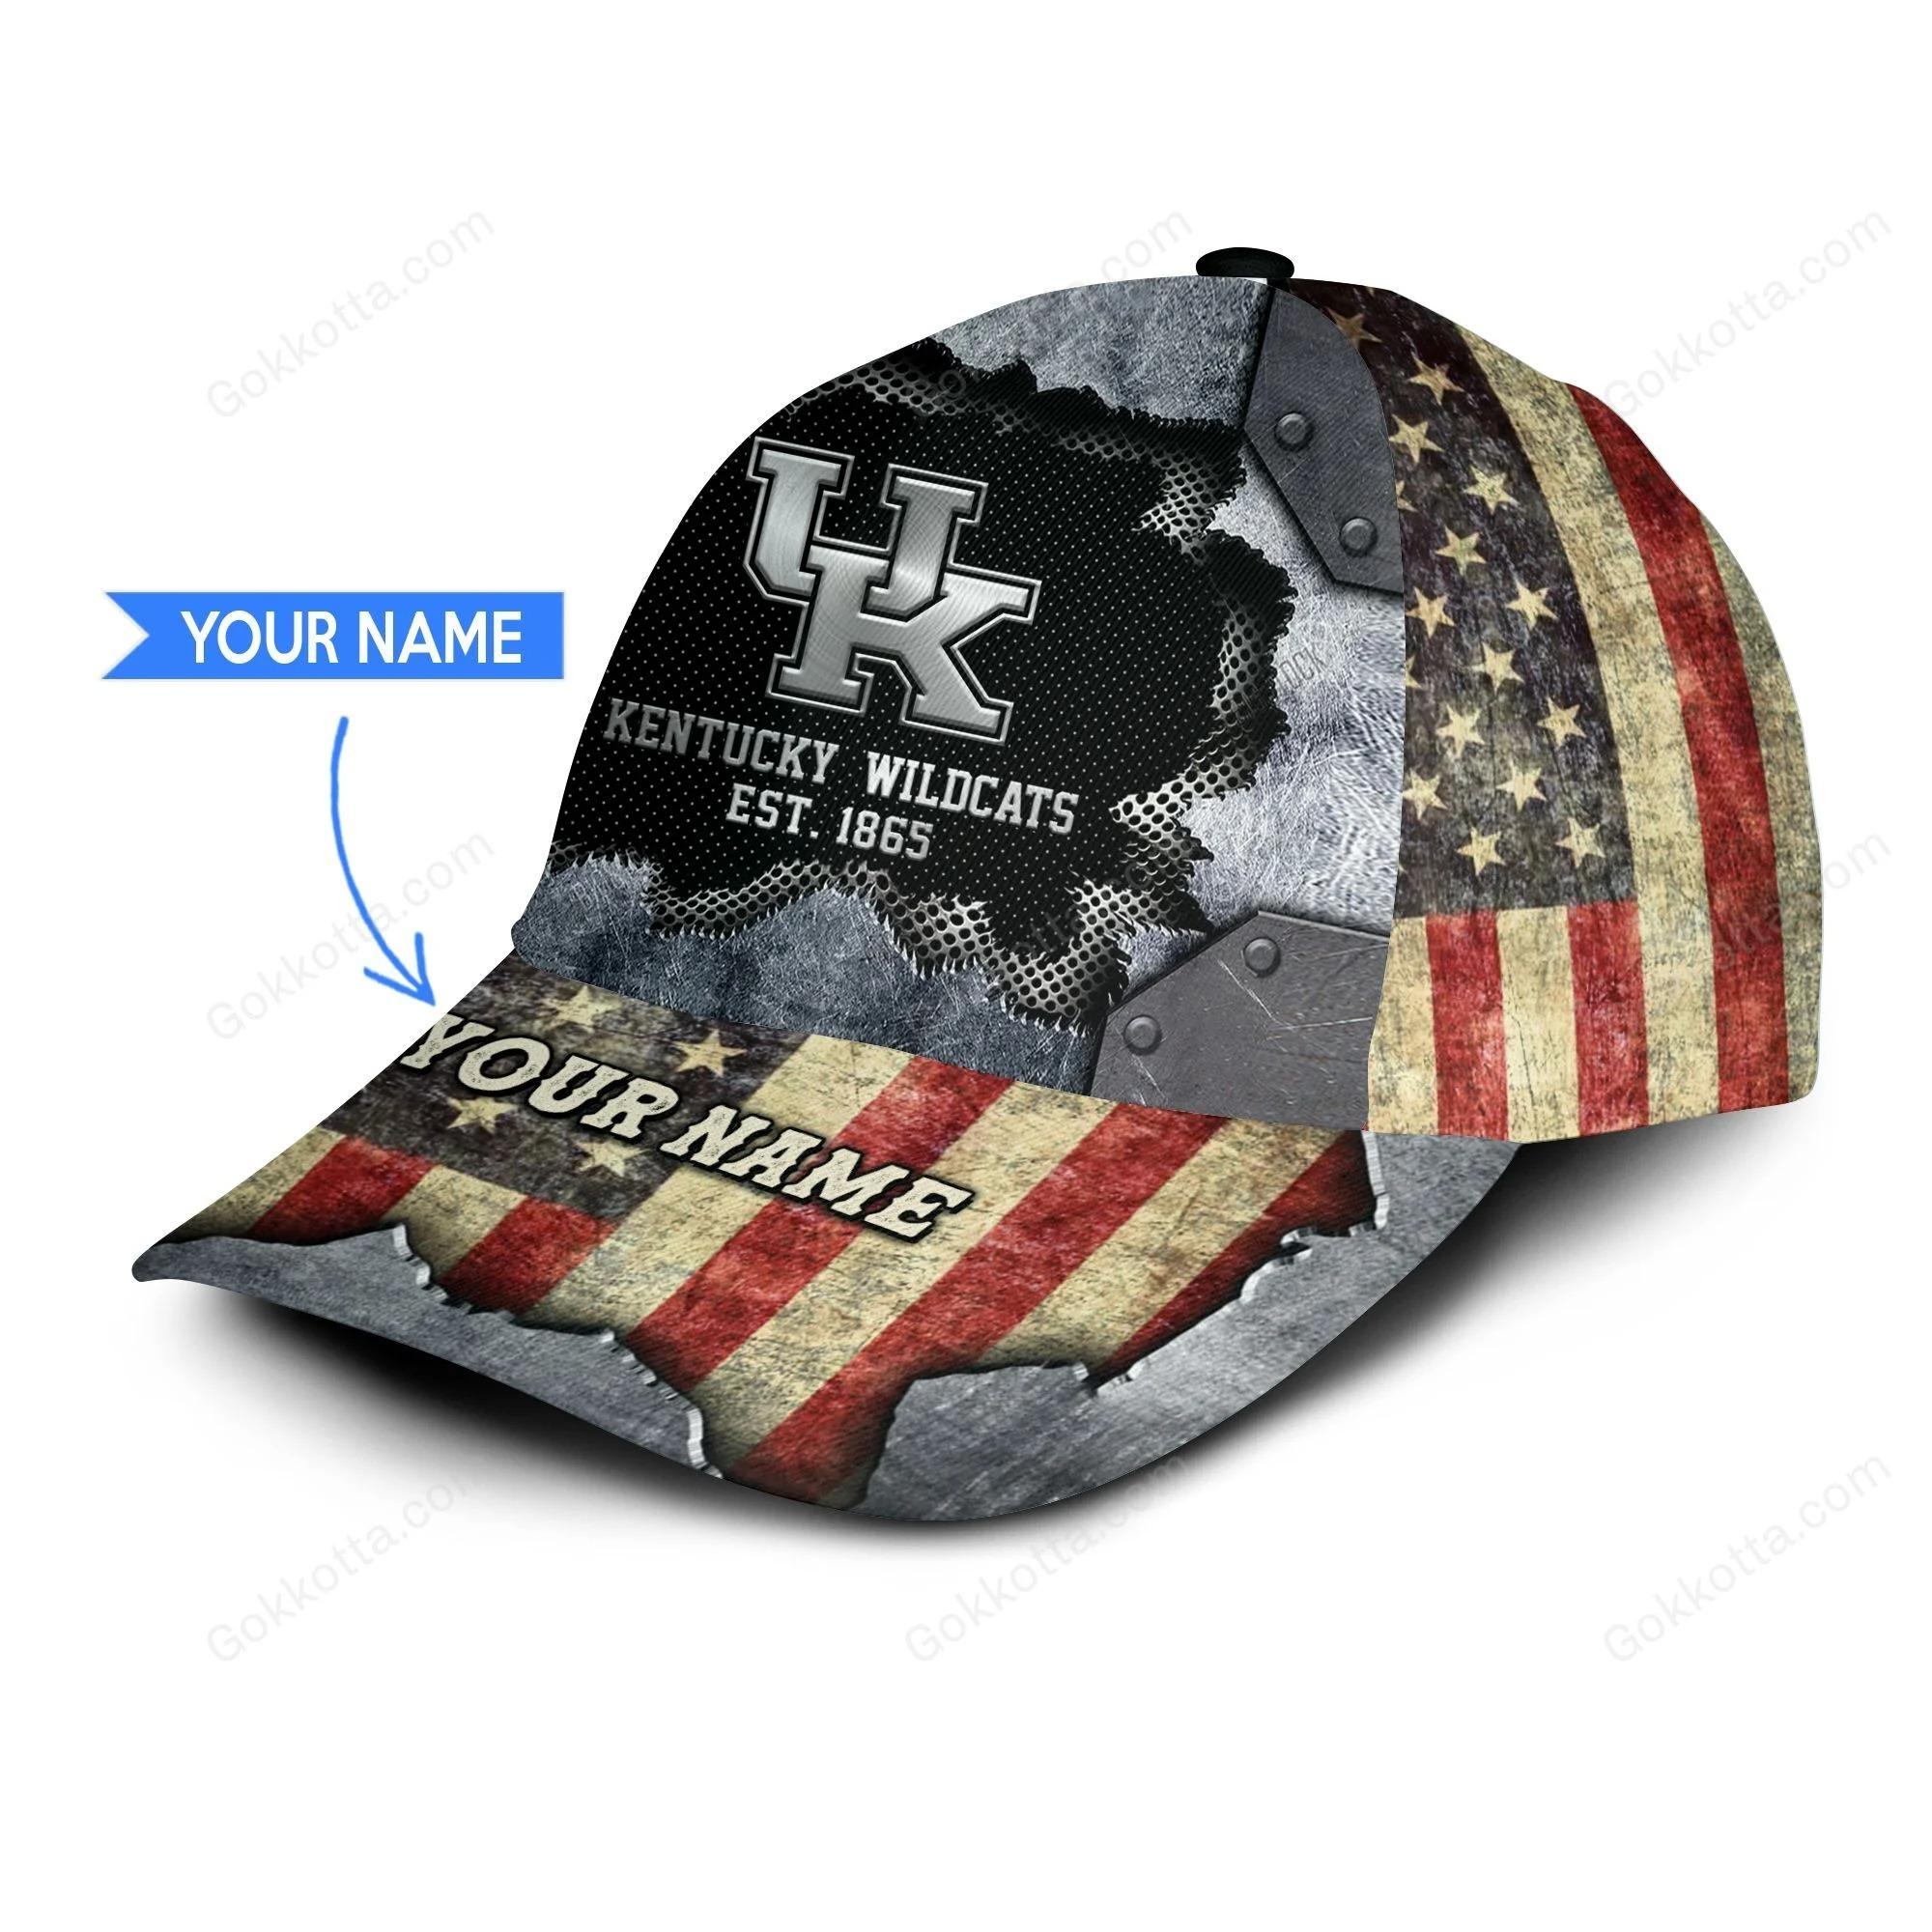 Kentucky wildcats est 1865 personalized classic cap 1